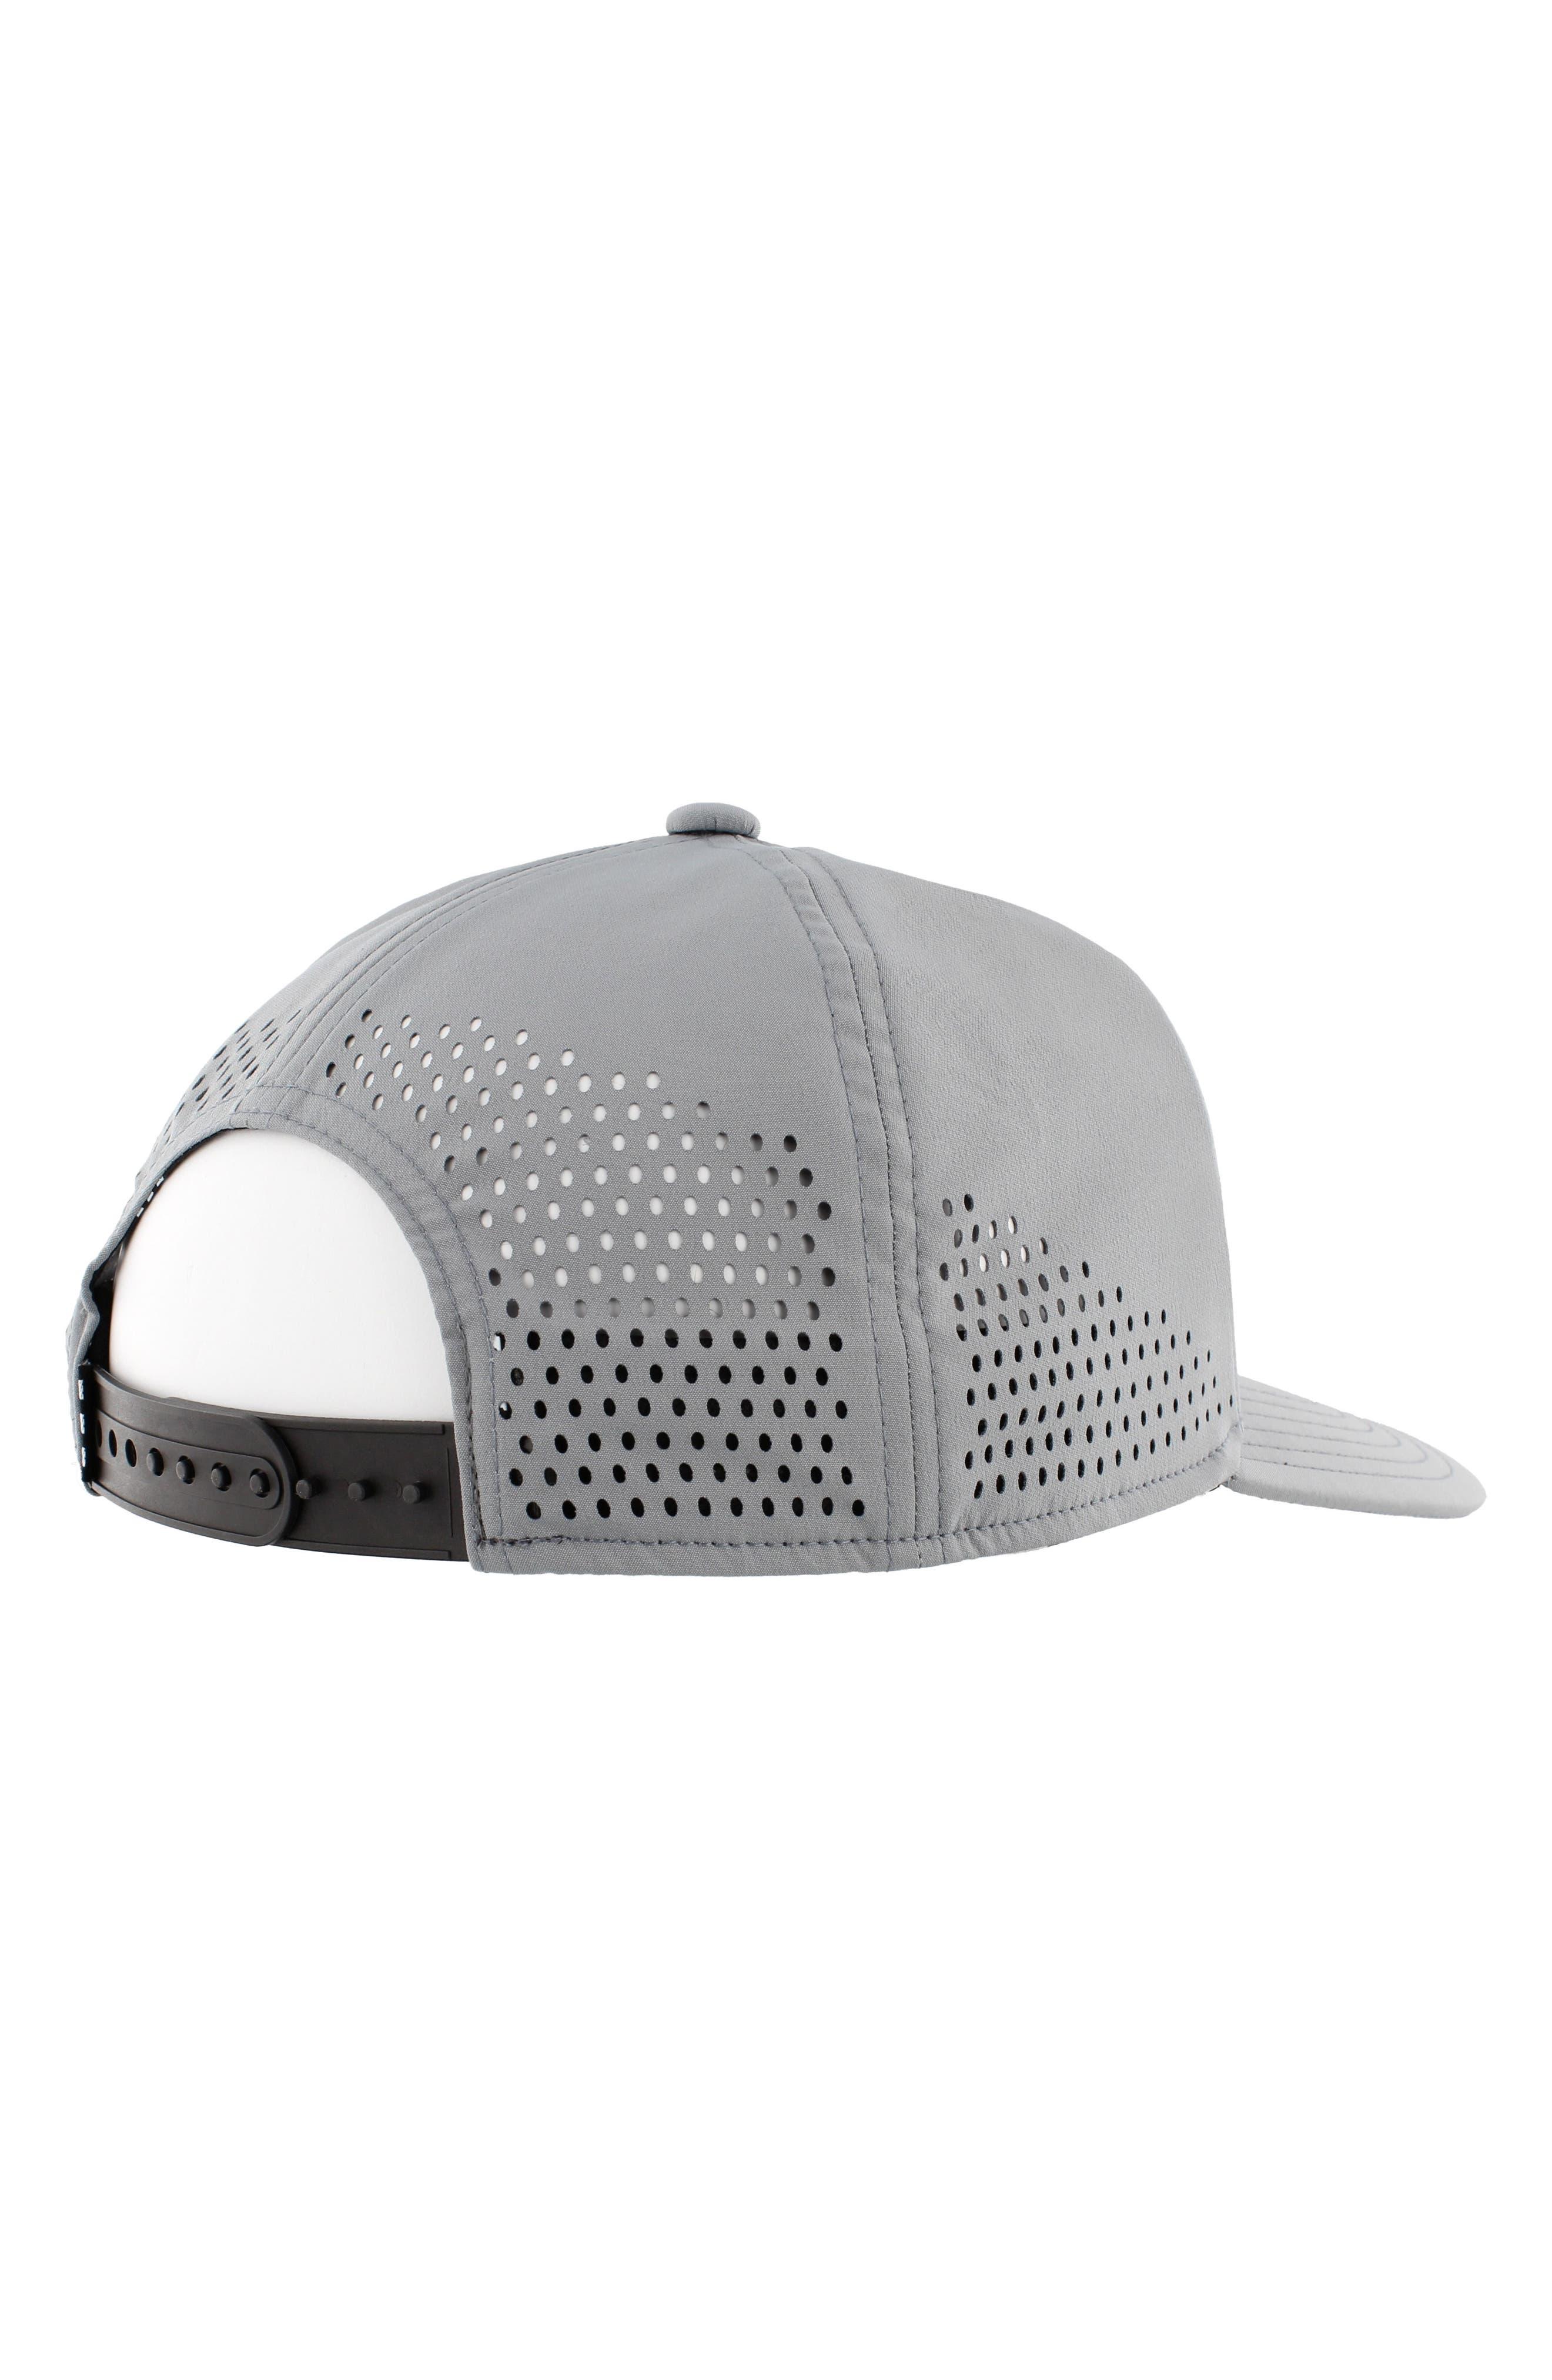 Tech Ventilated Baseball Cap,                             Alternate thumbnail 2, color,                             MED GREY